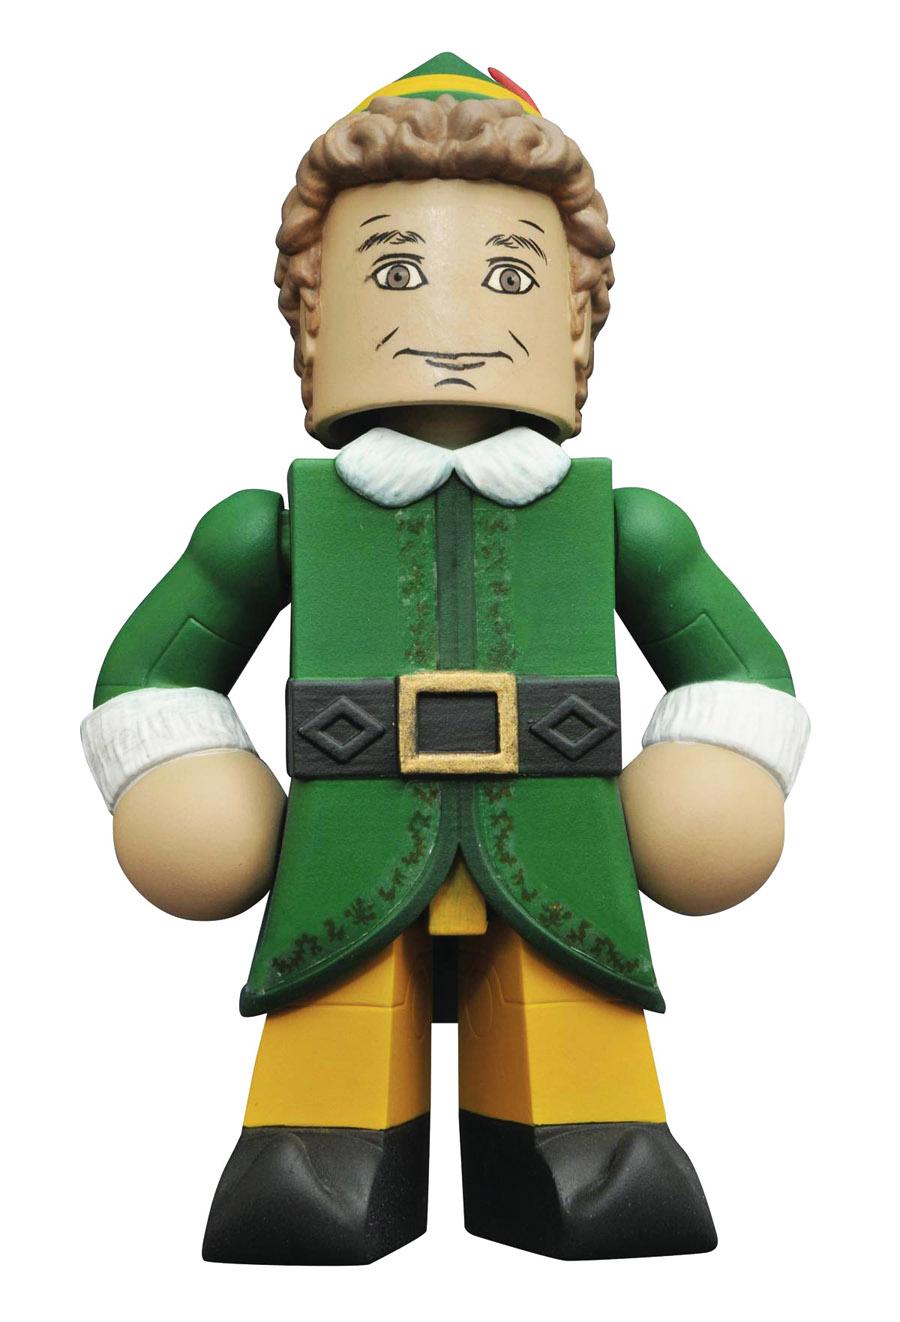 Luke S Toy Store Elf Minimates